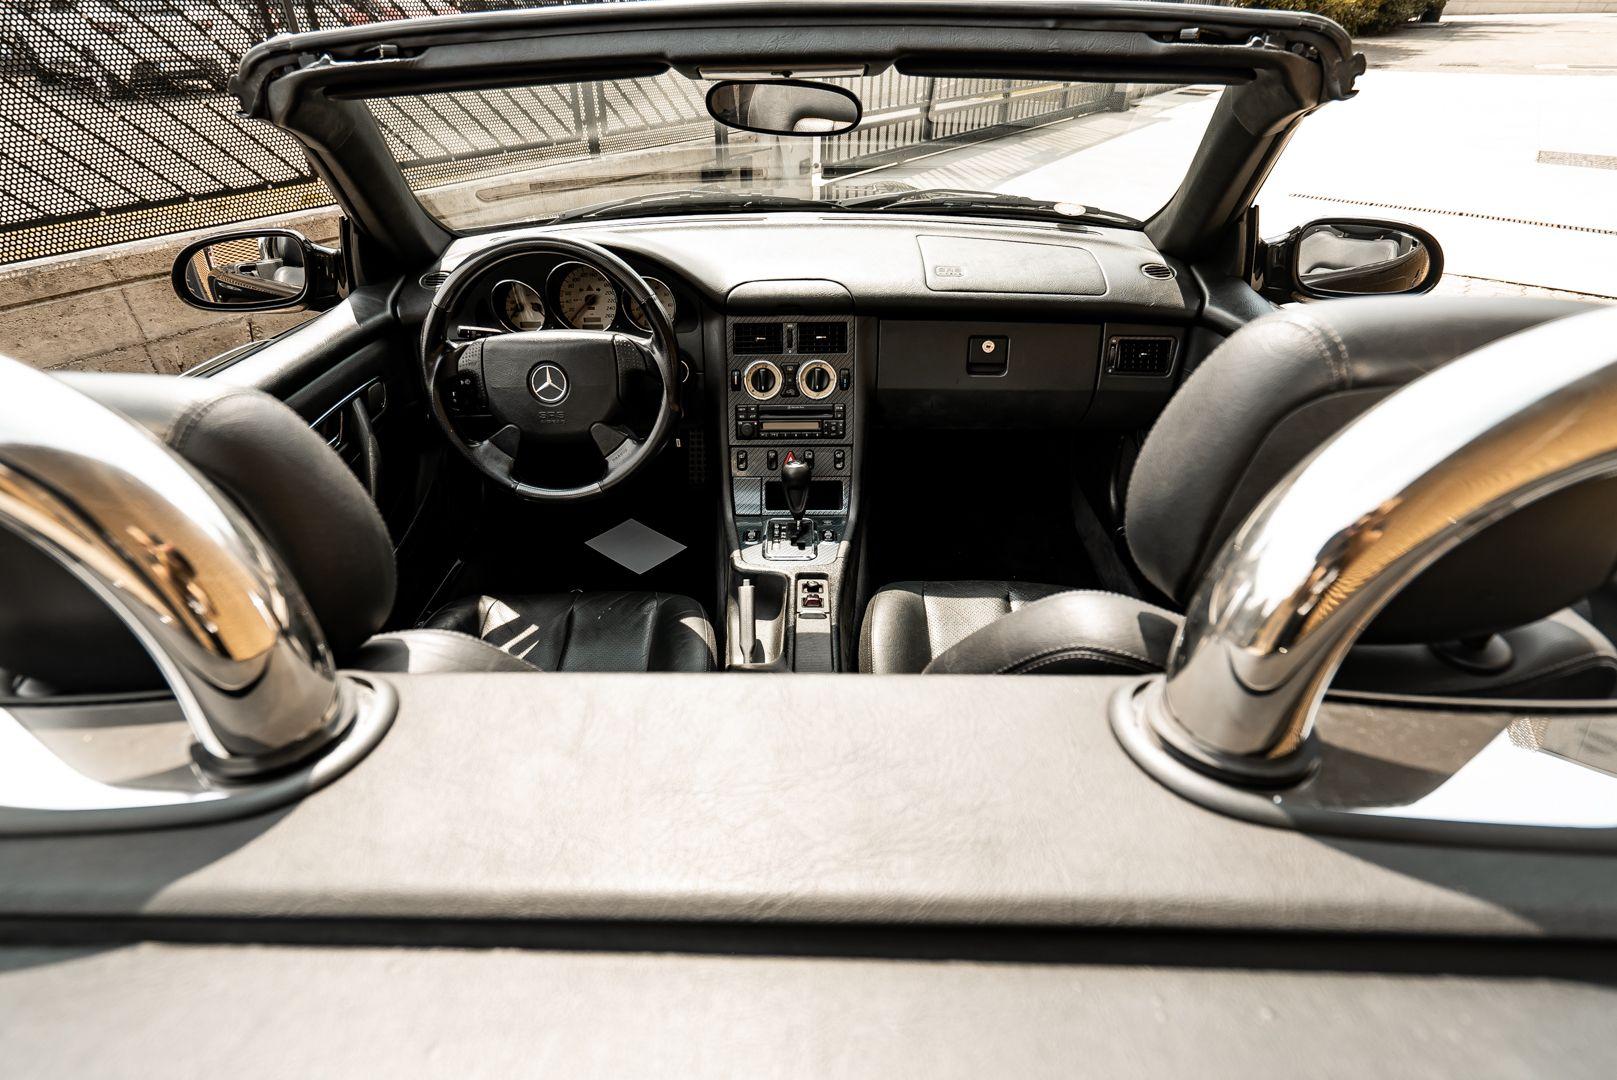 1998 Mercedes-Benz SLK 230 Brabus K1 73755